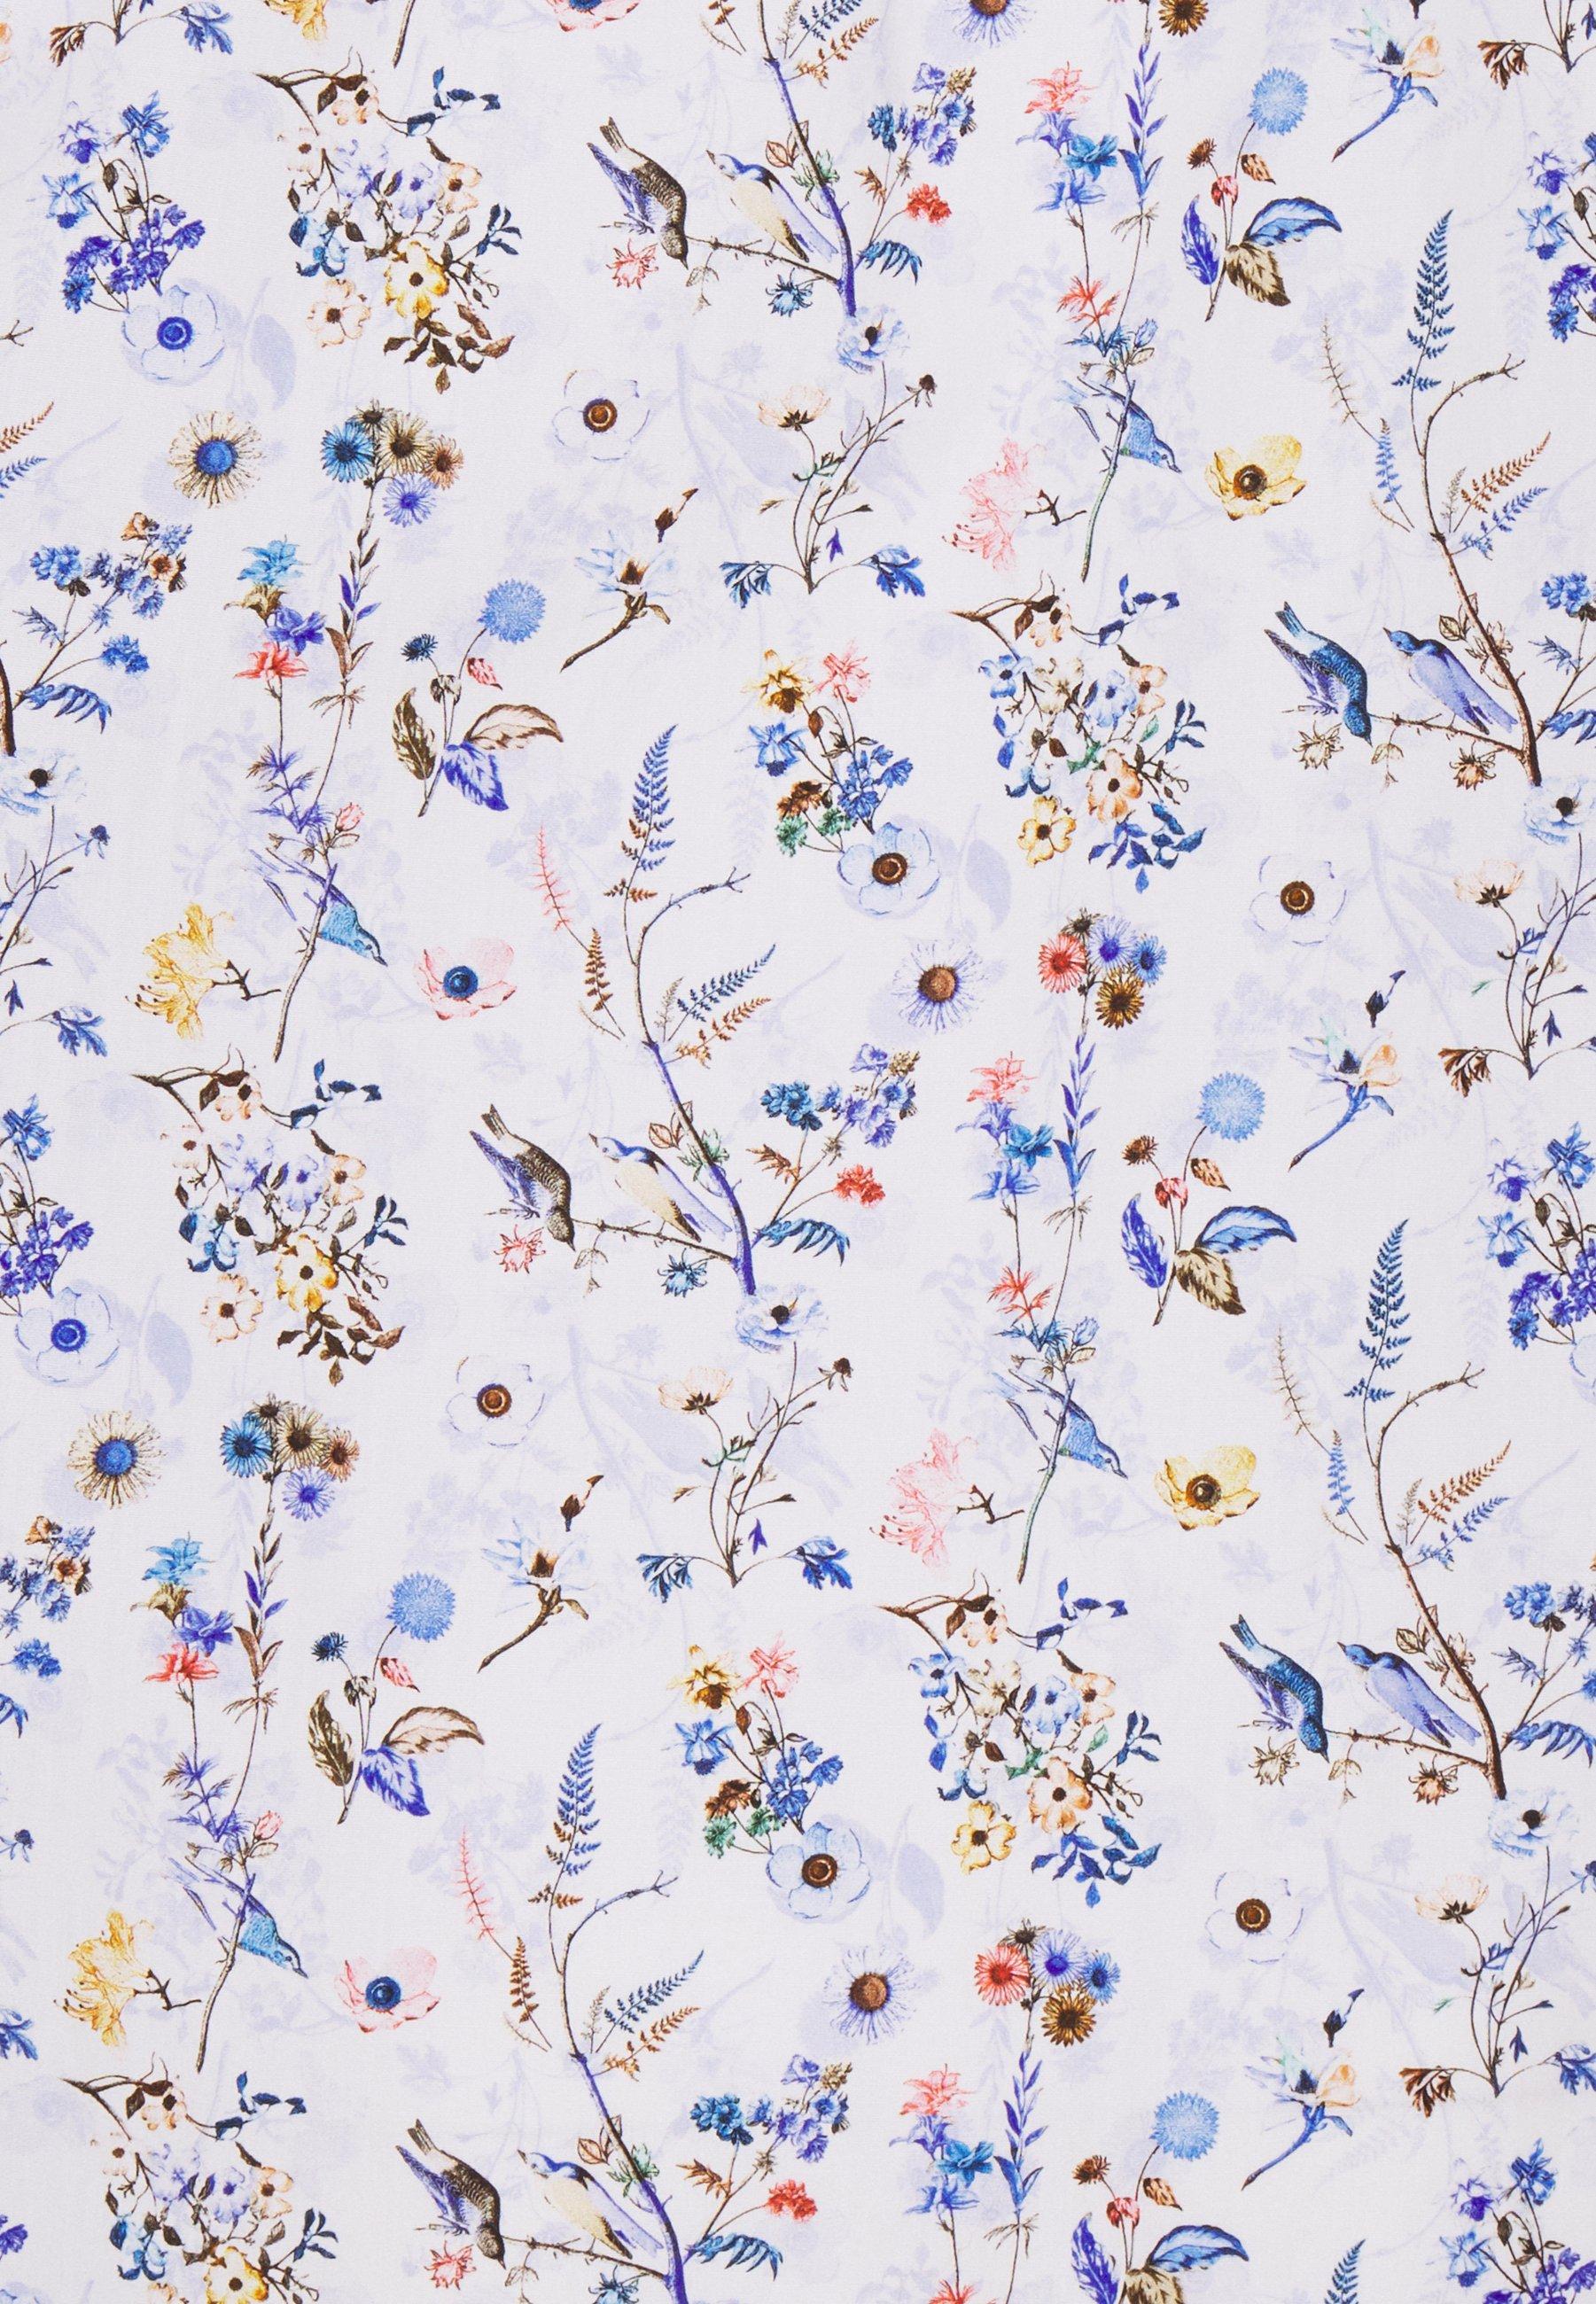 2020 New Women's Clothing Seidensticker Button-down blouse light blue r2pb0QUjj